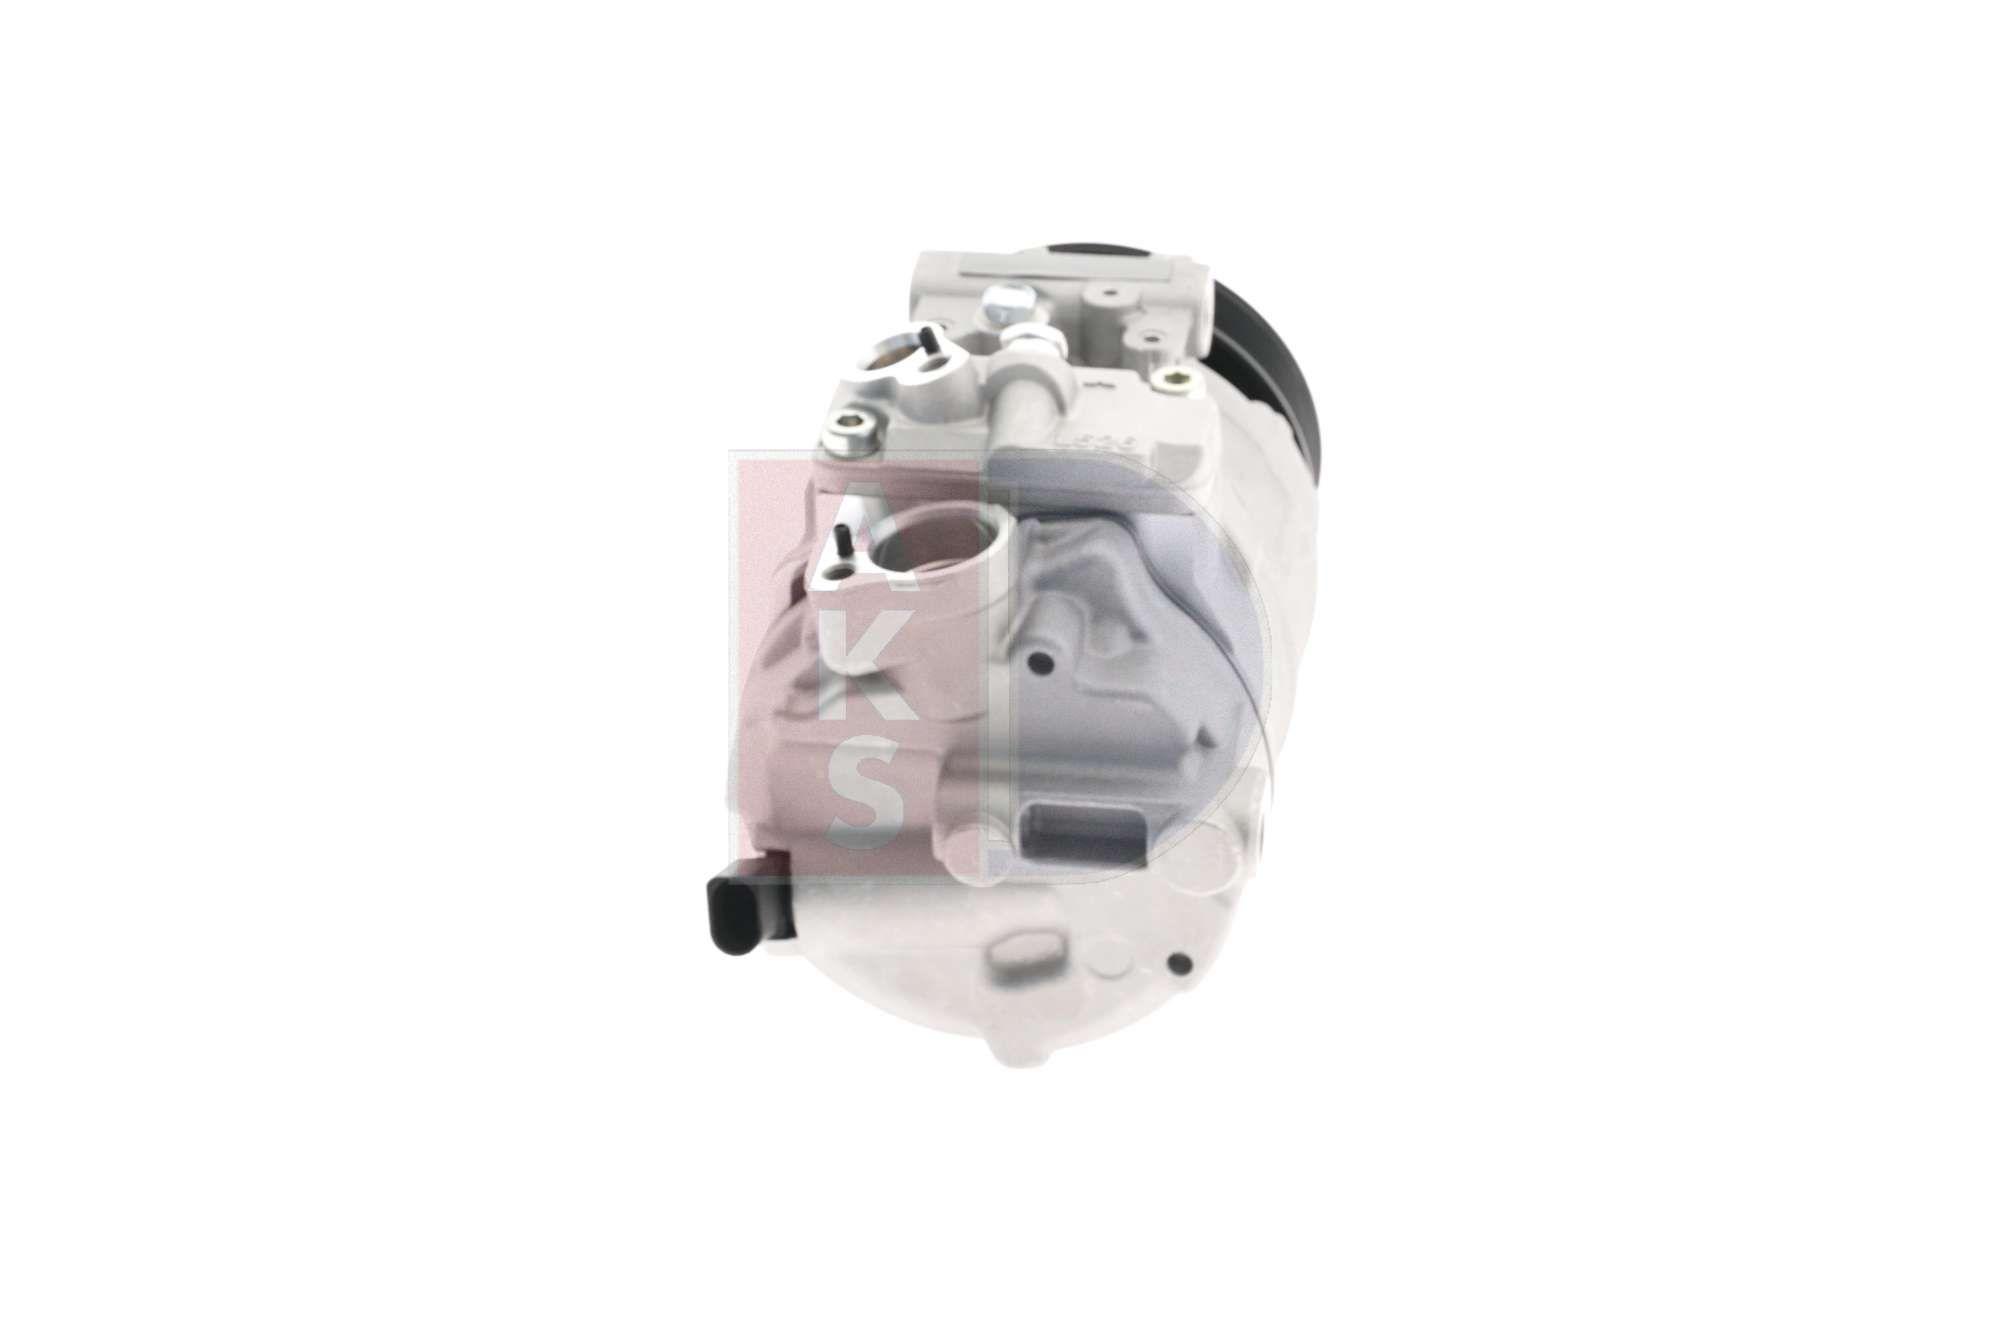 Kältemittelkompressor AKS DASIS 850682N 4044455451969